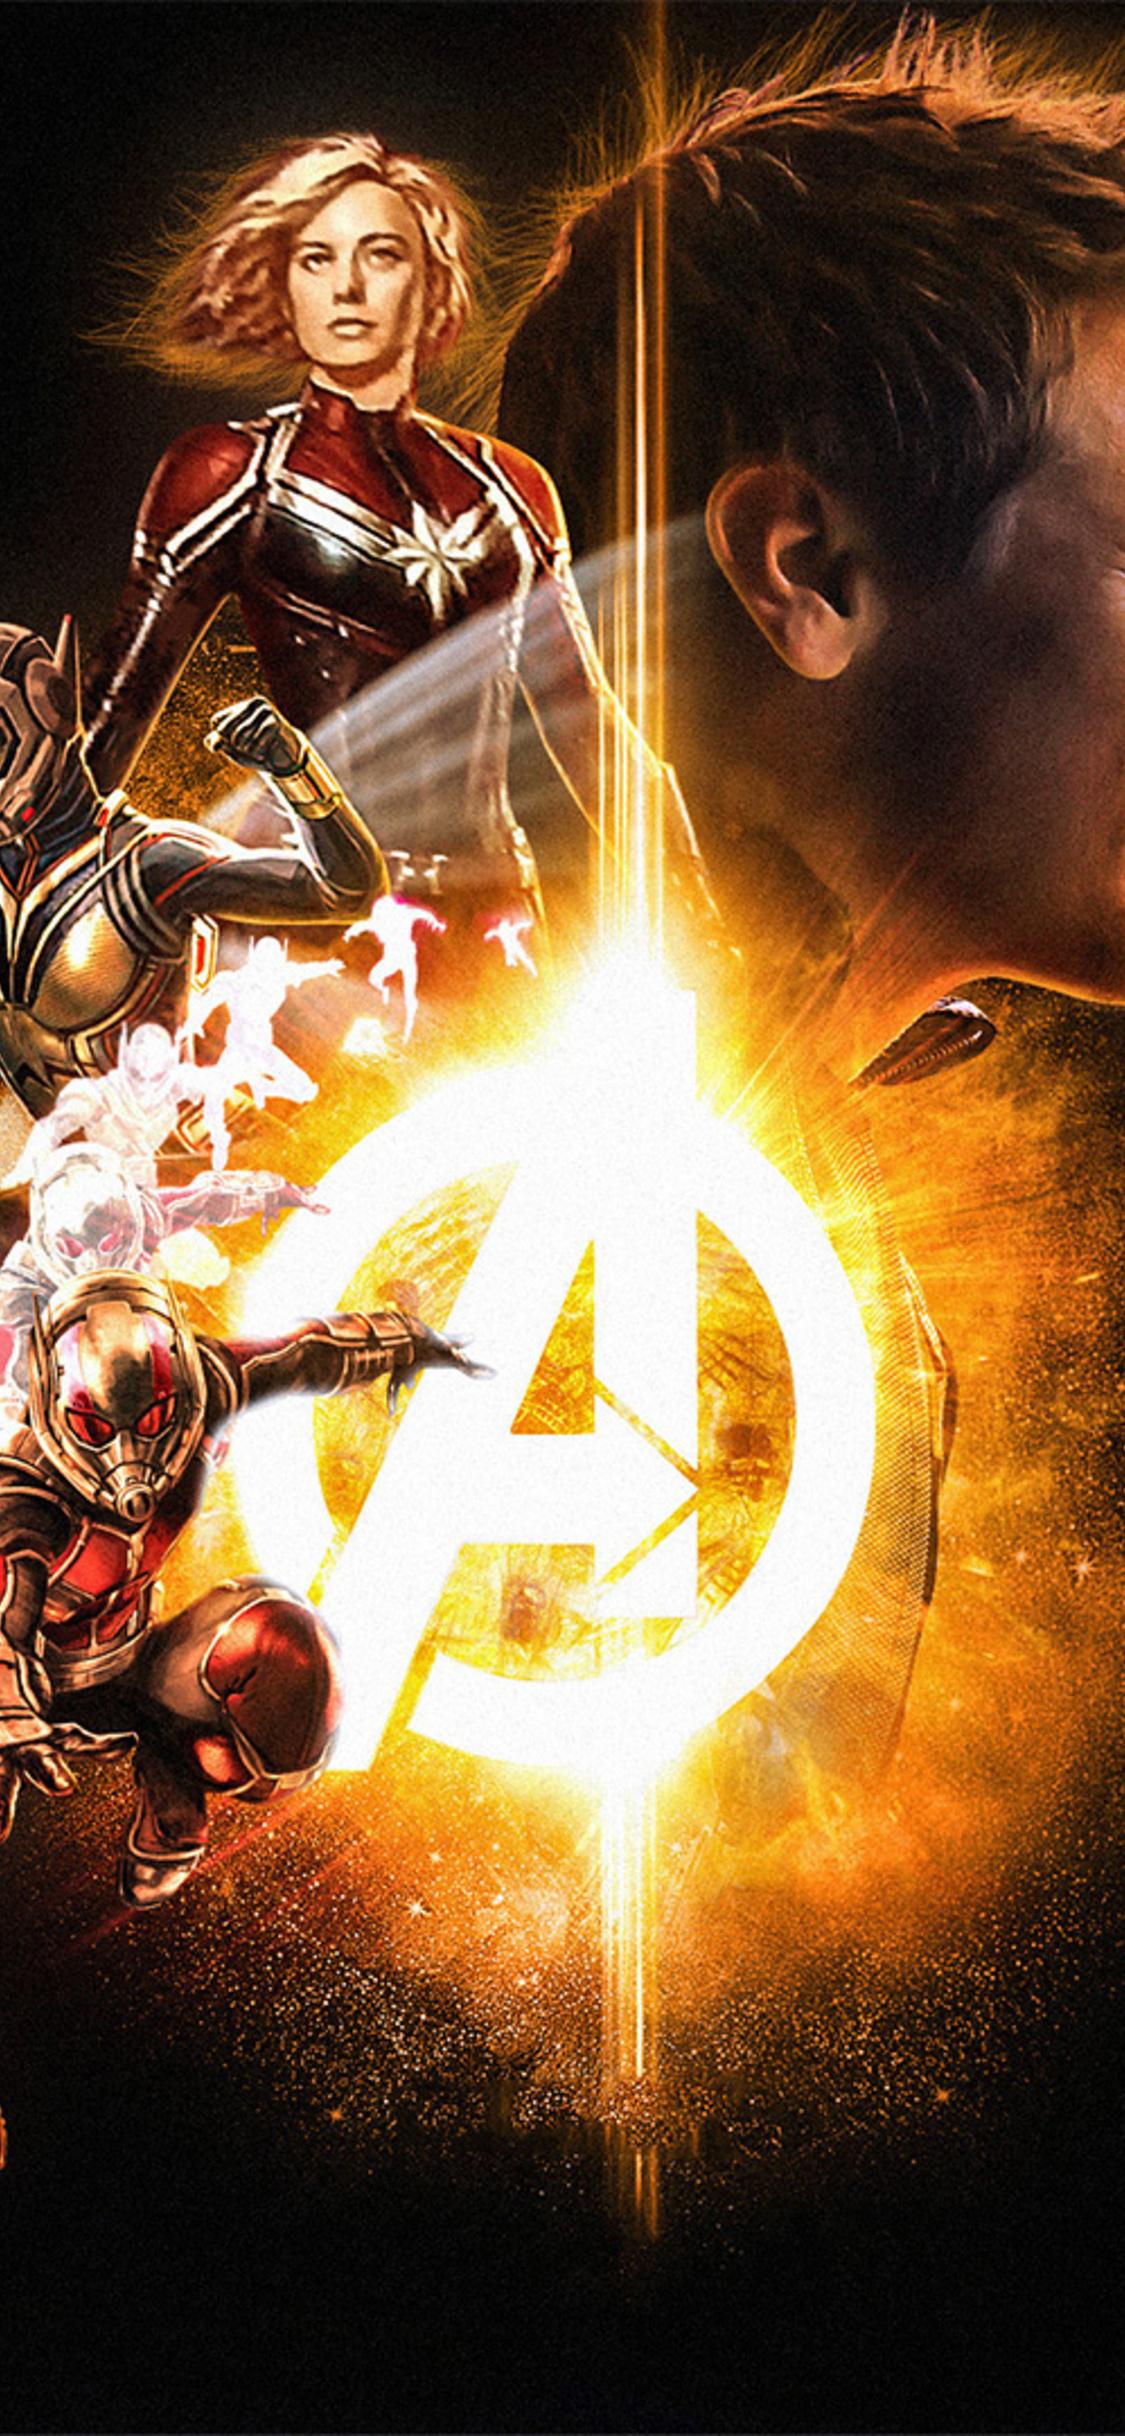 1125x2436 Avengers Infinity War 2018 Soul Stone Poster Iphone Xs